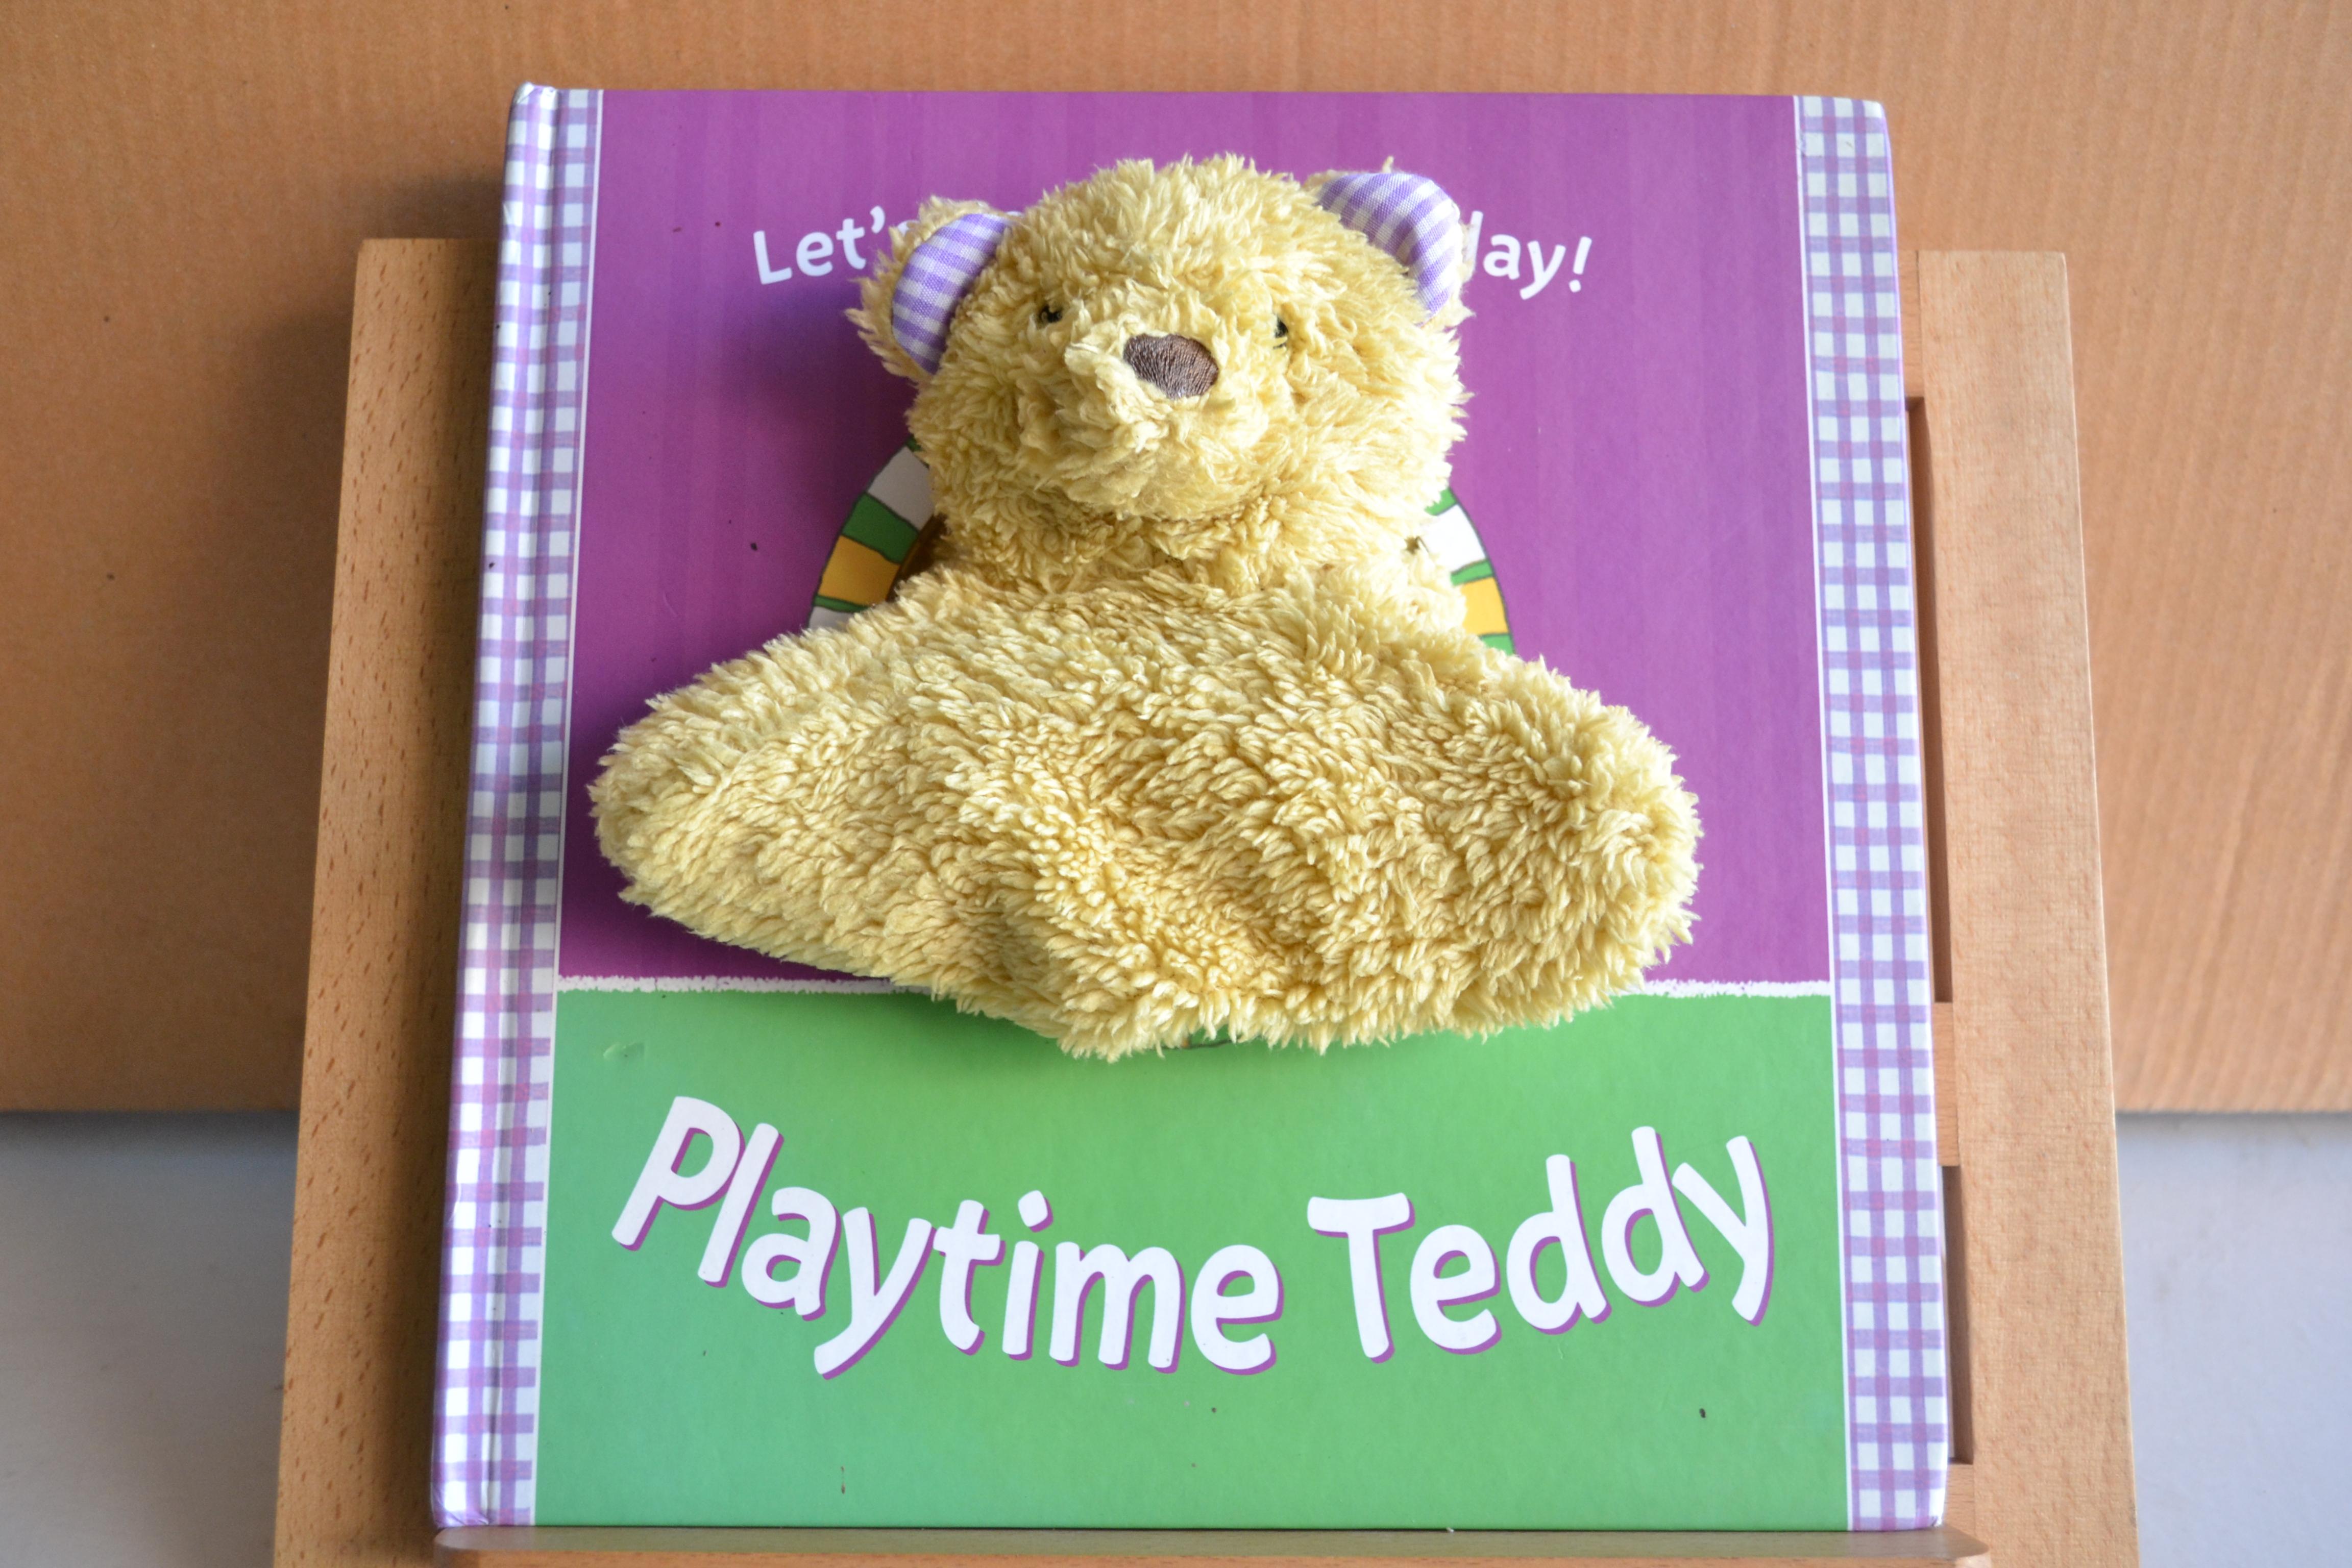 Playtime Teddy